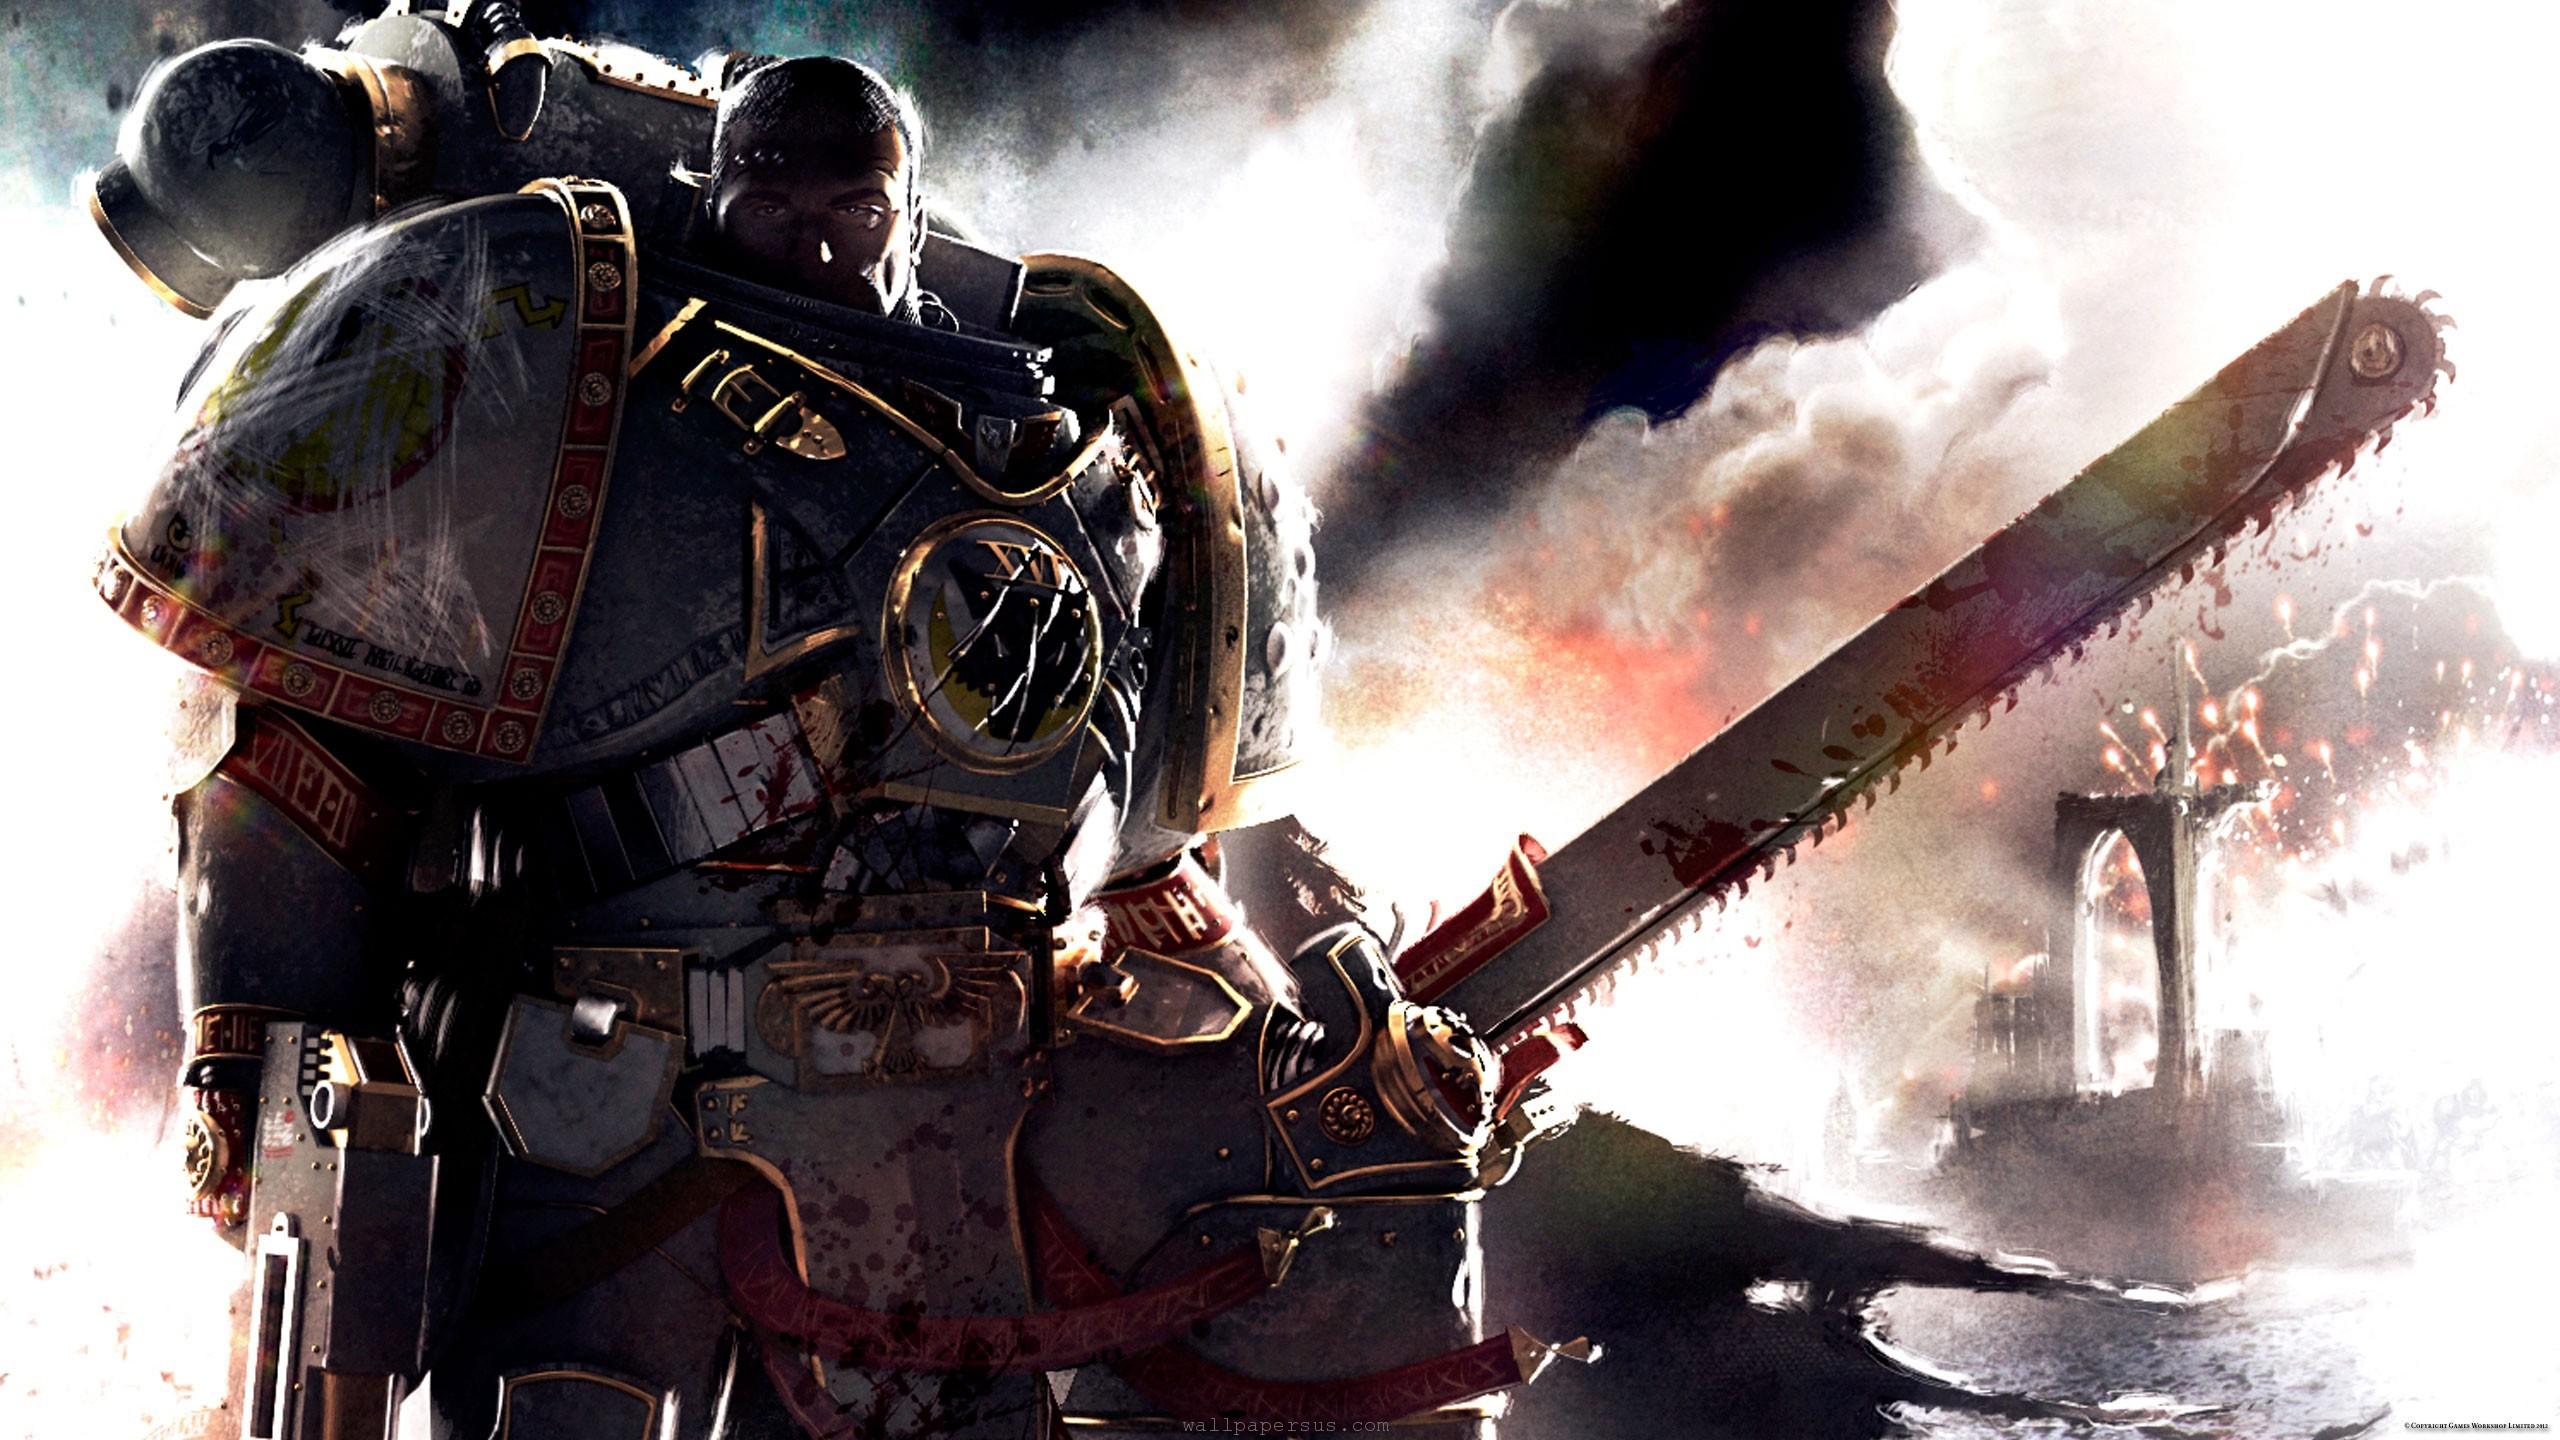 space marines fiction science warhammer legion wallpaper 2560x1440